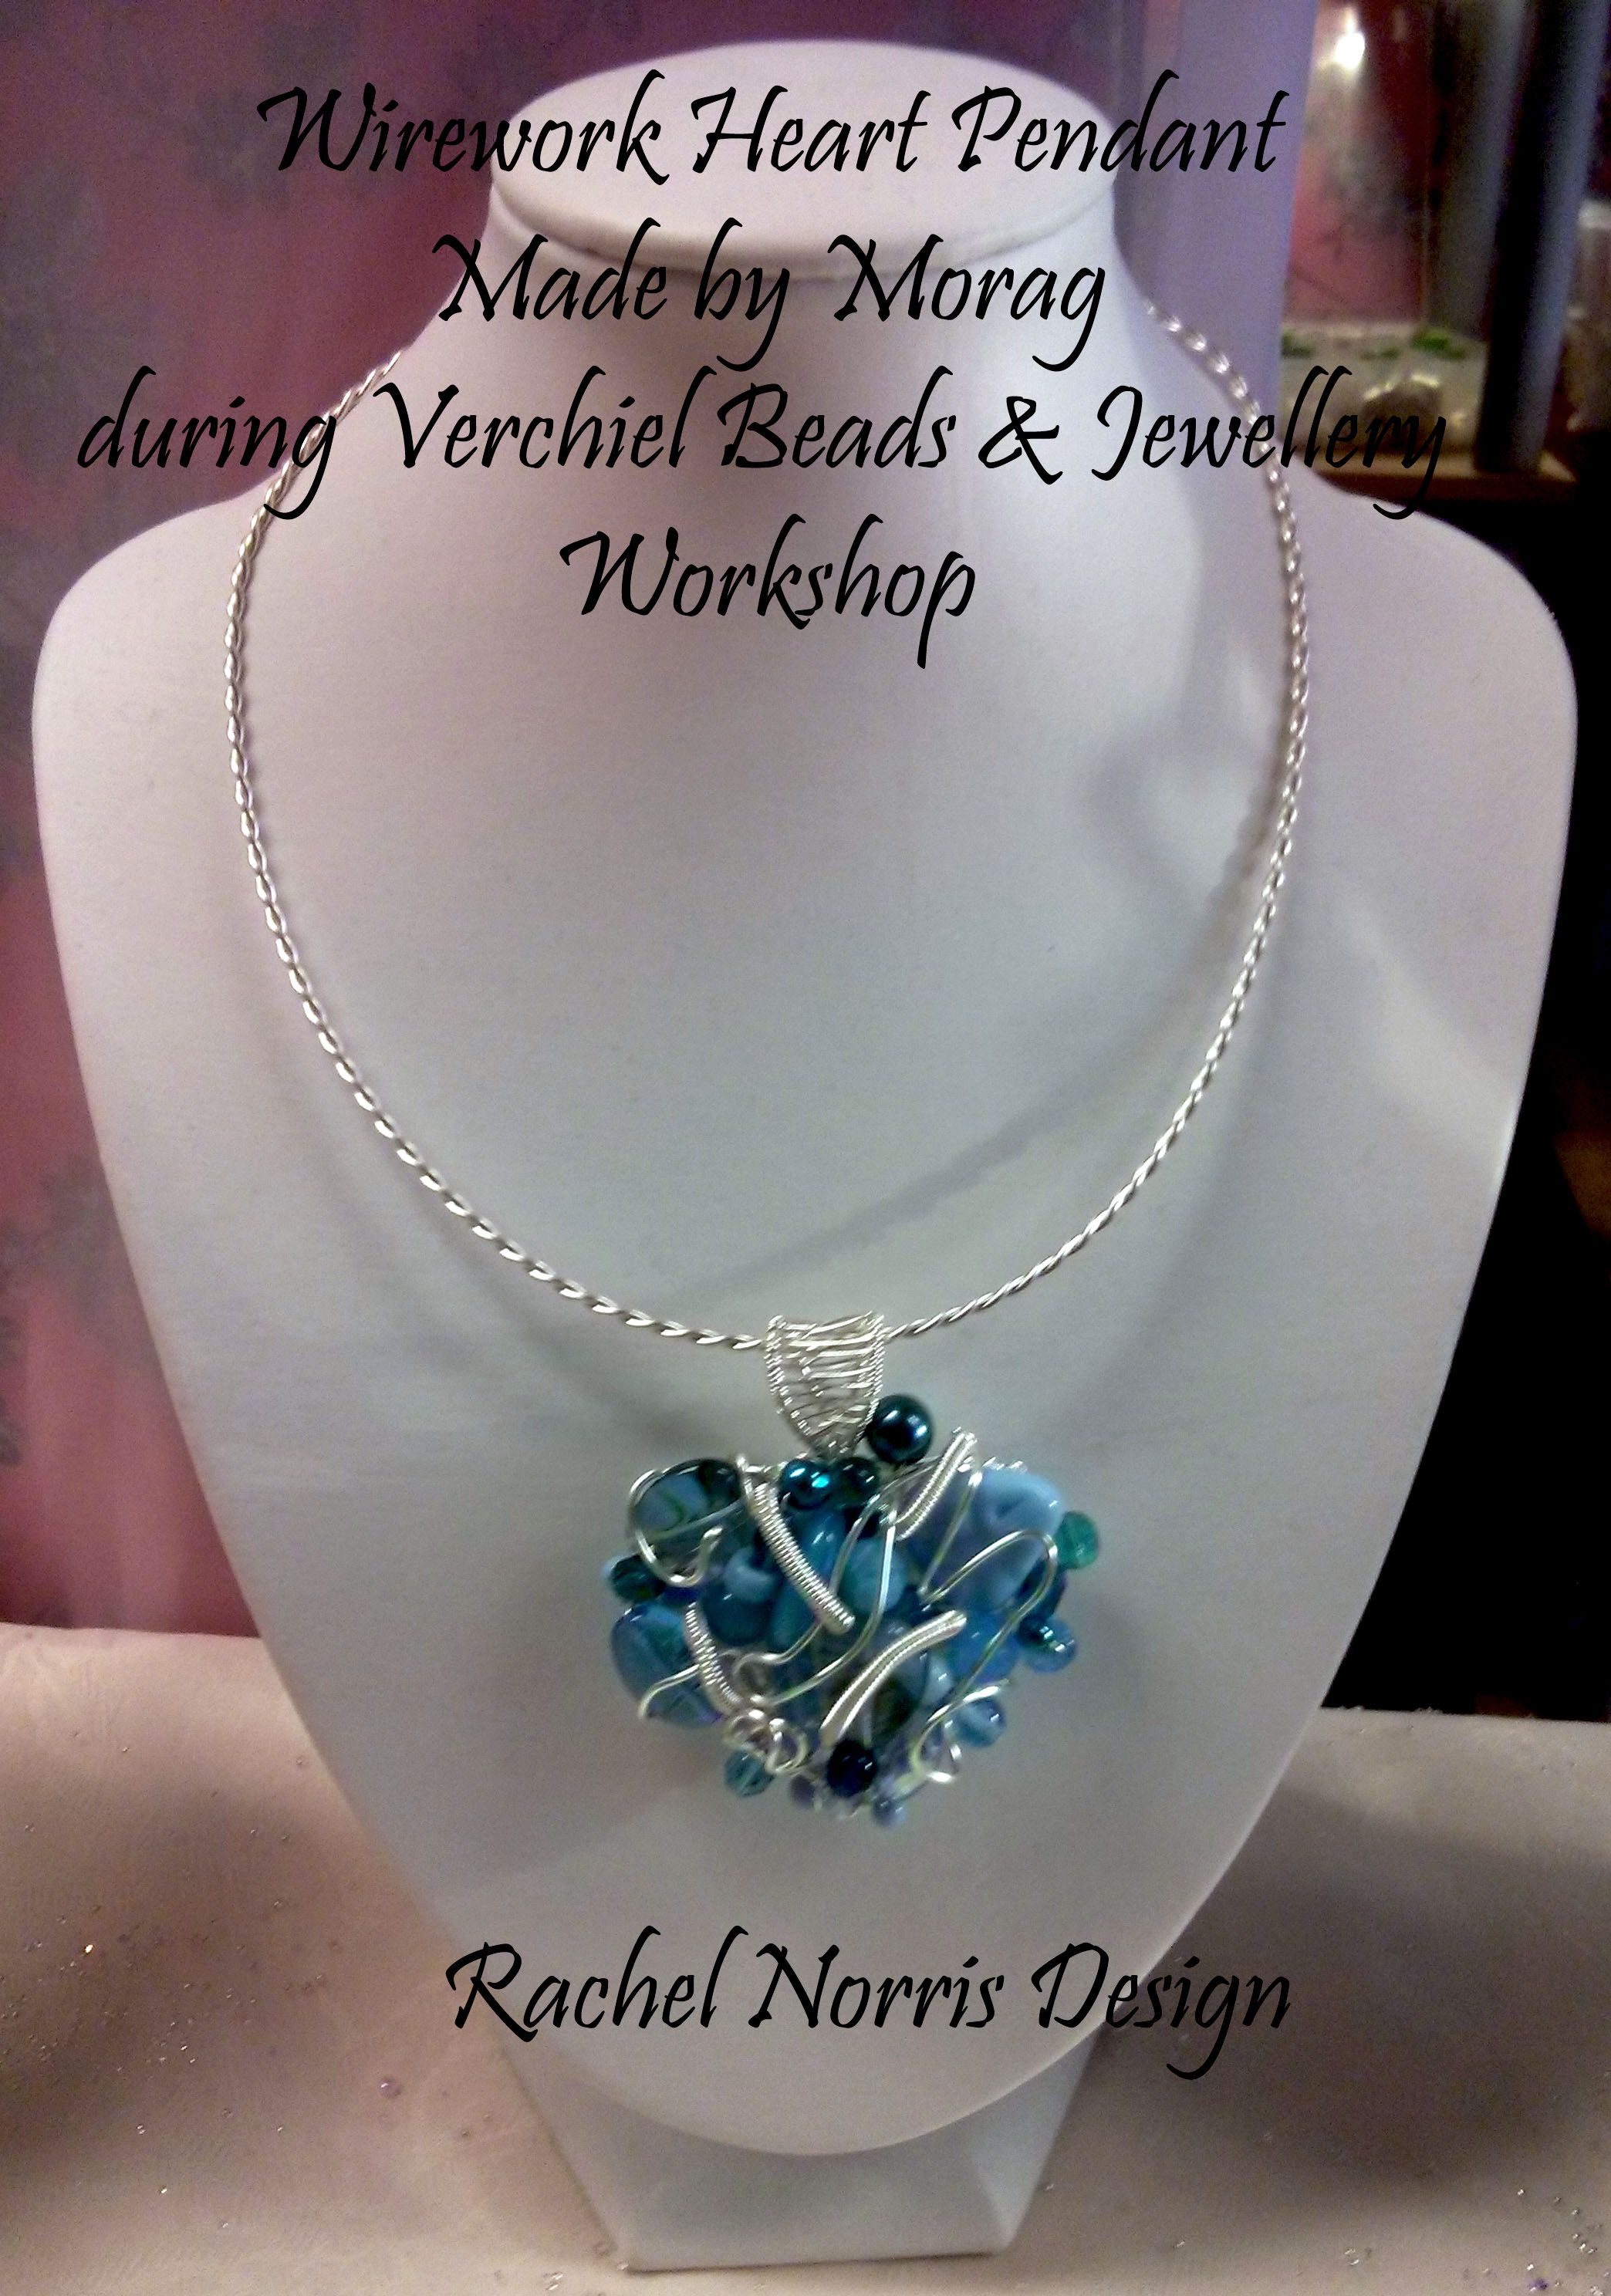 Wirework heart Pendant made by Morag, during Verchiel Beads and jewellery workshop.  Rachel Norris inspired Design.